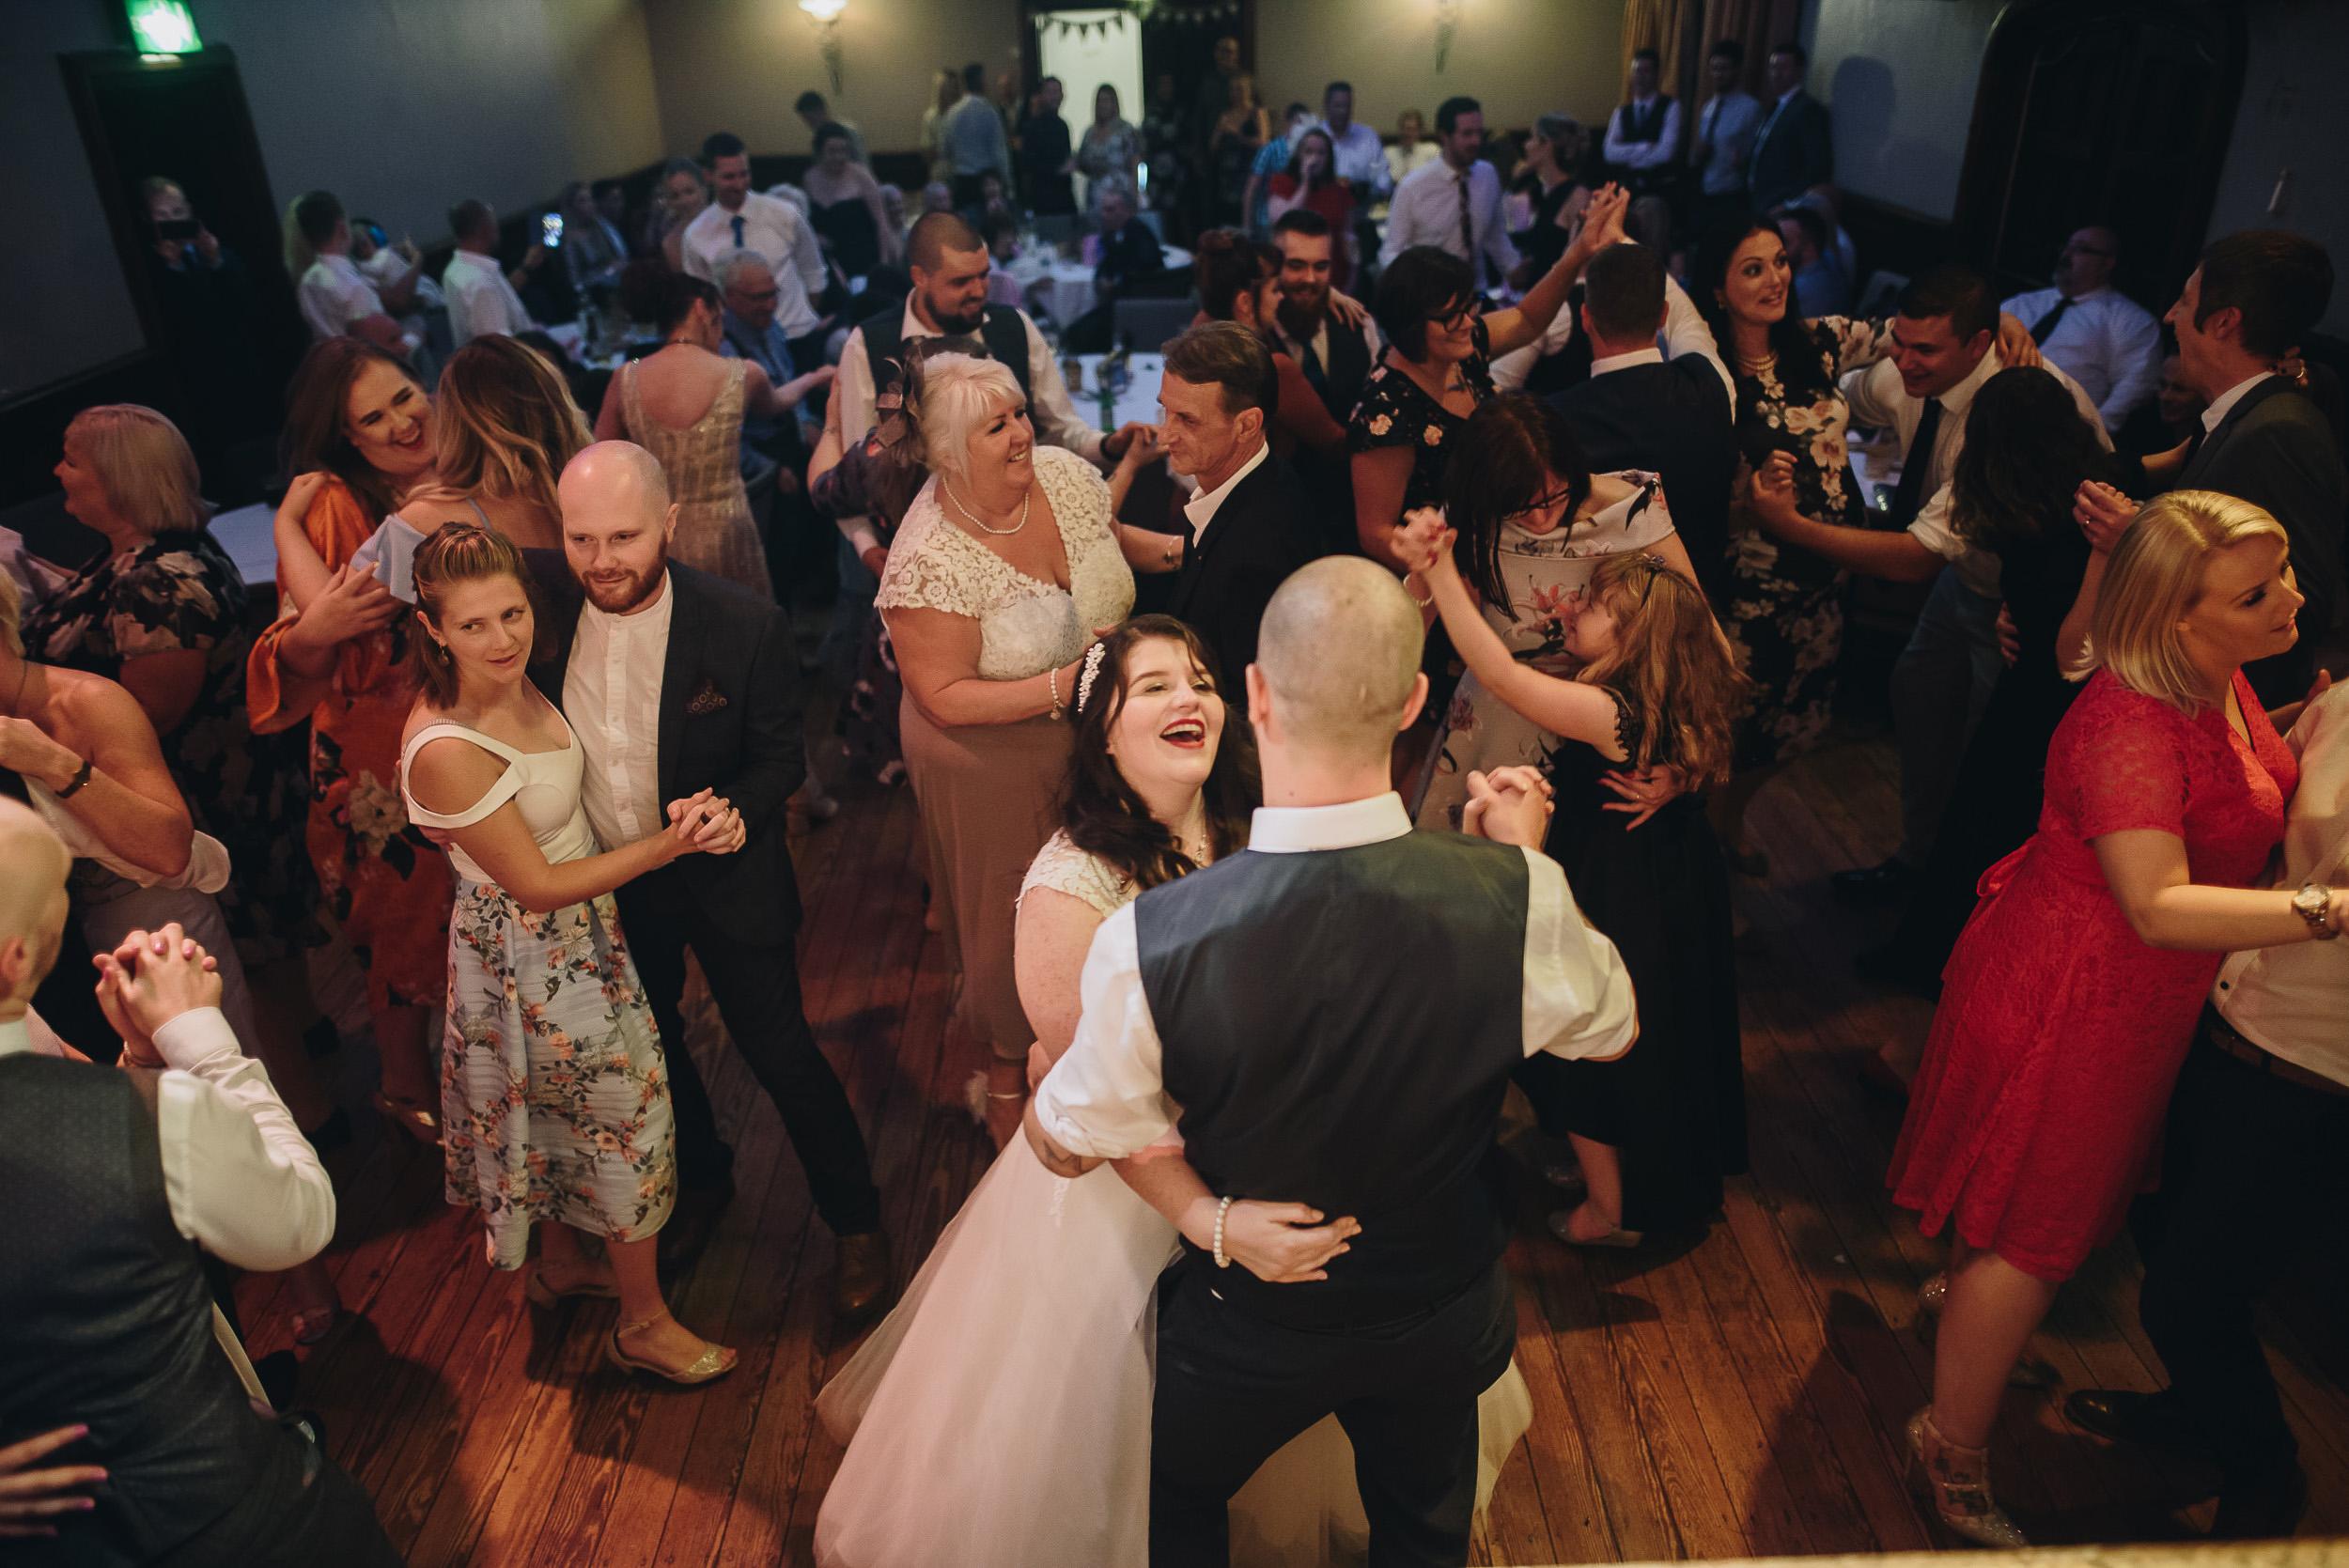 Smithills-hall-wedding-manchester-the-barlow-edgworth-hadfield-120.jpg